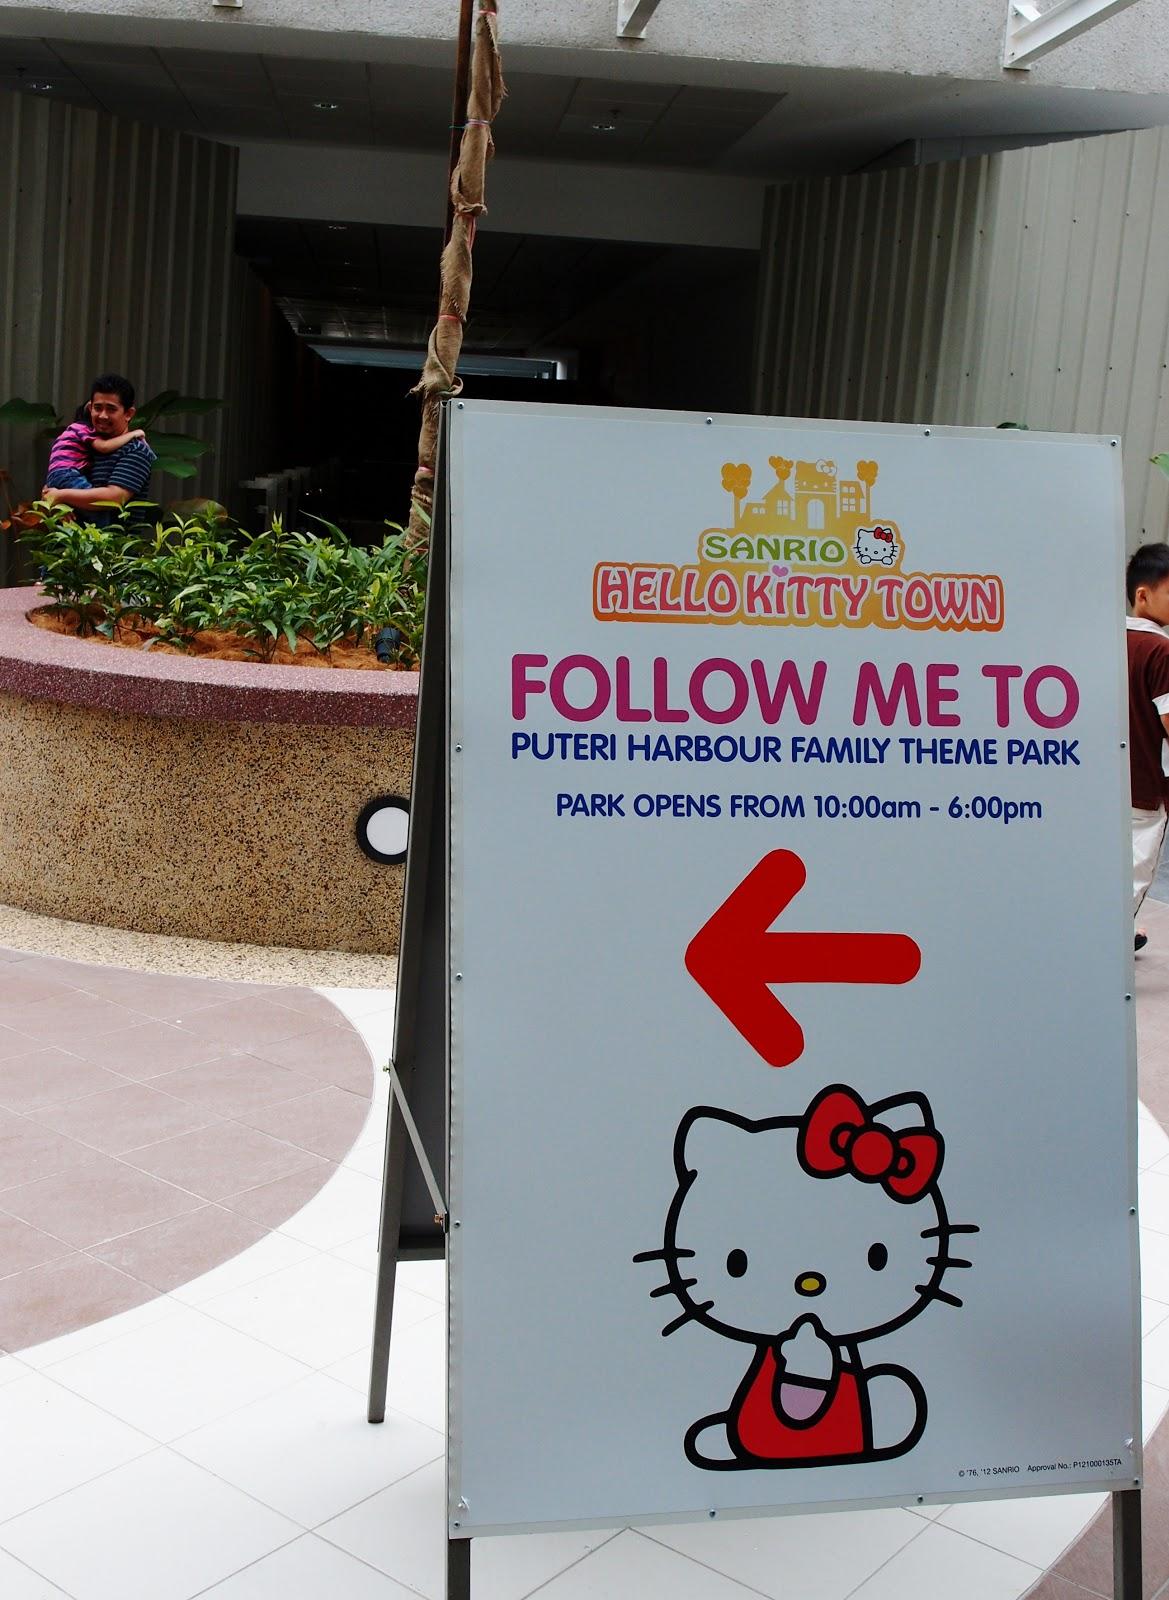 Hello kitty town puteri harbour family theme park johor bahru malaysia - Ticketing Counter